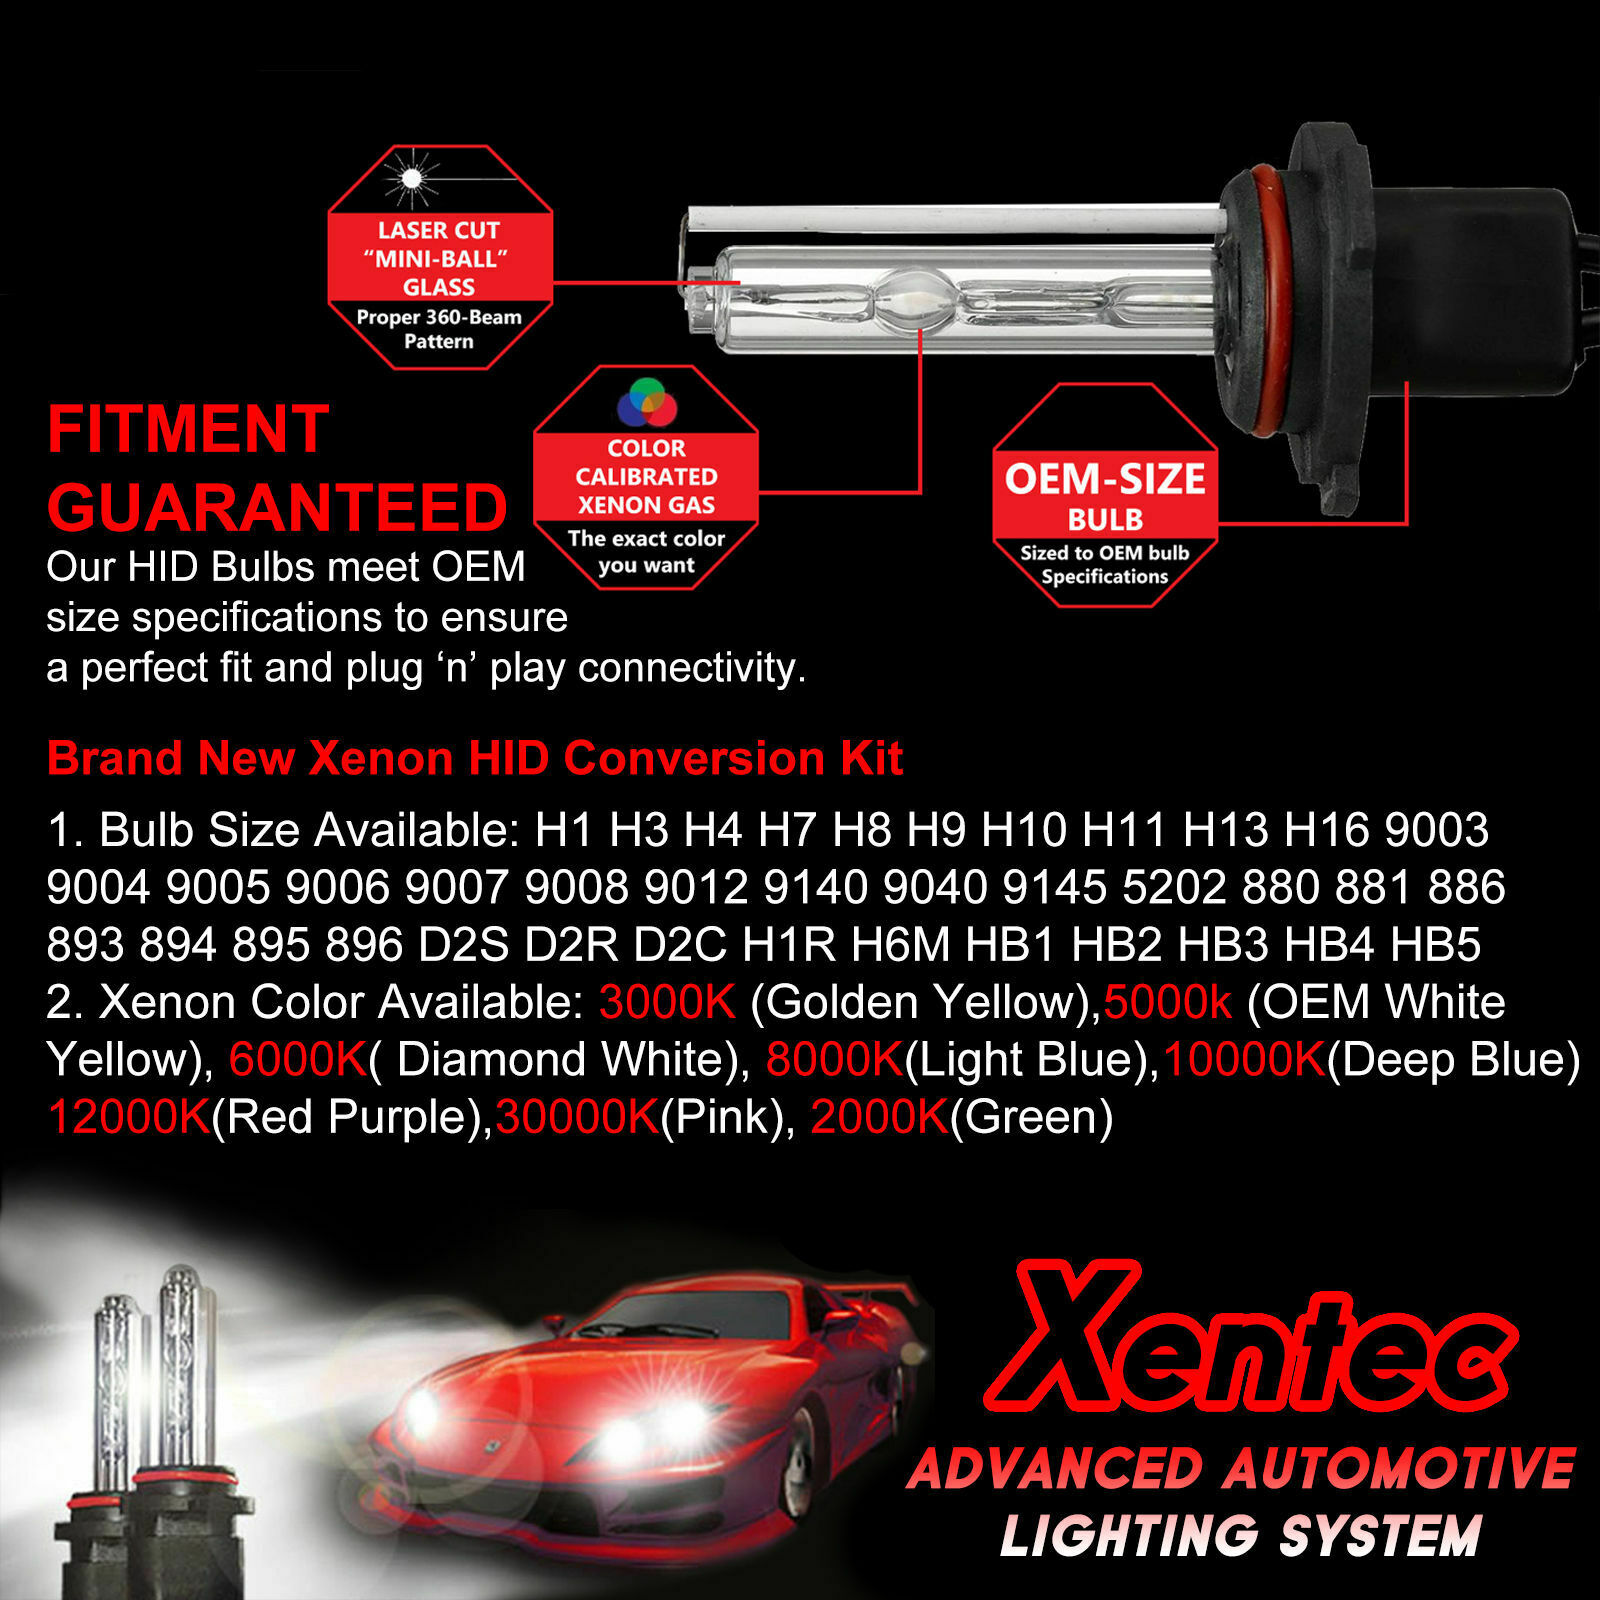 Xentec Xenon Headlight HID Kit for Honda Civic Accord H4 H11 9005 9006 880 H10 3